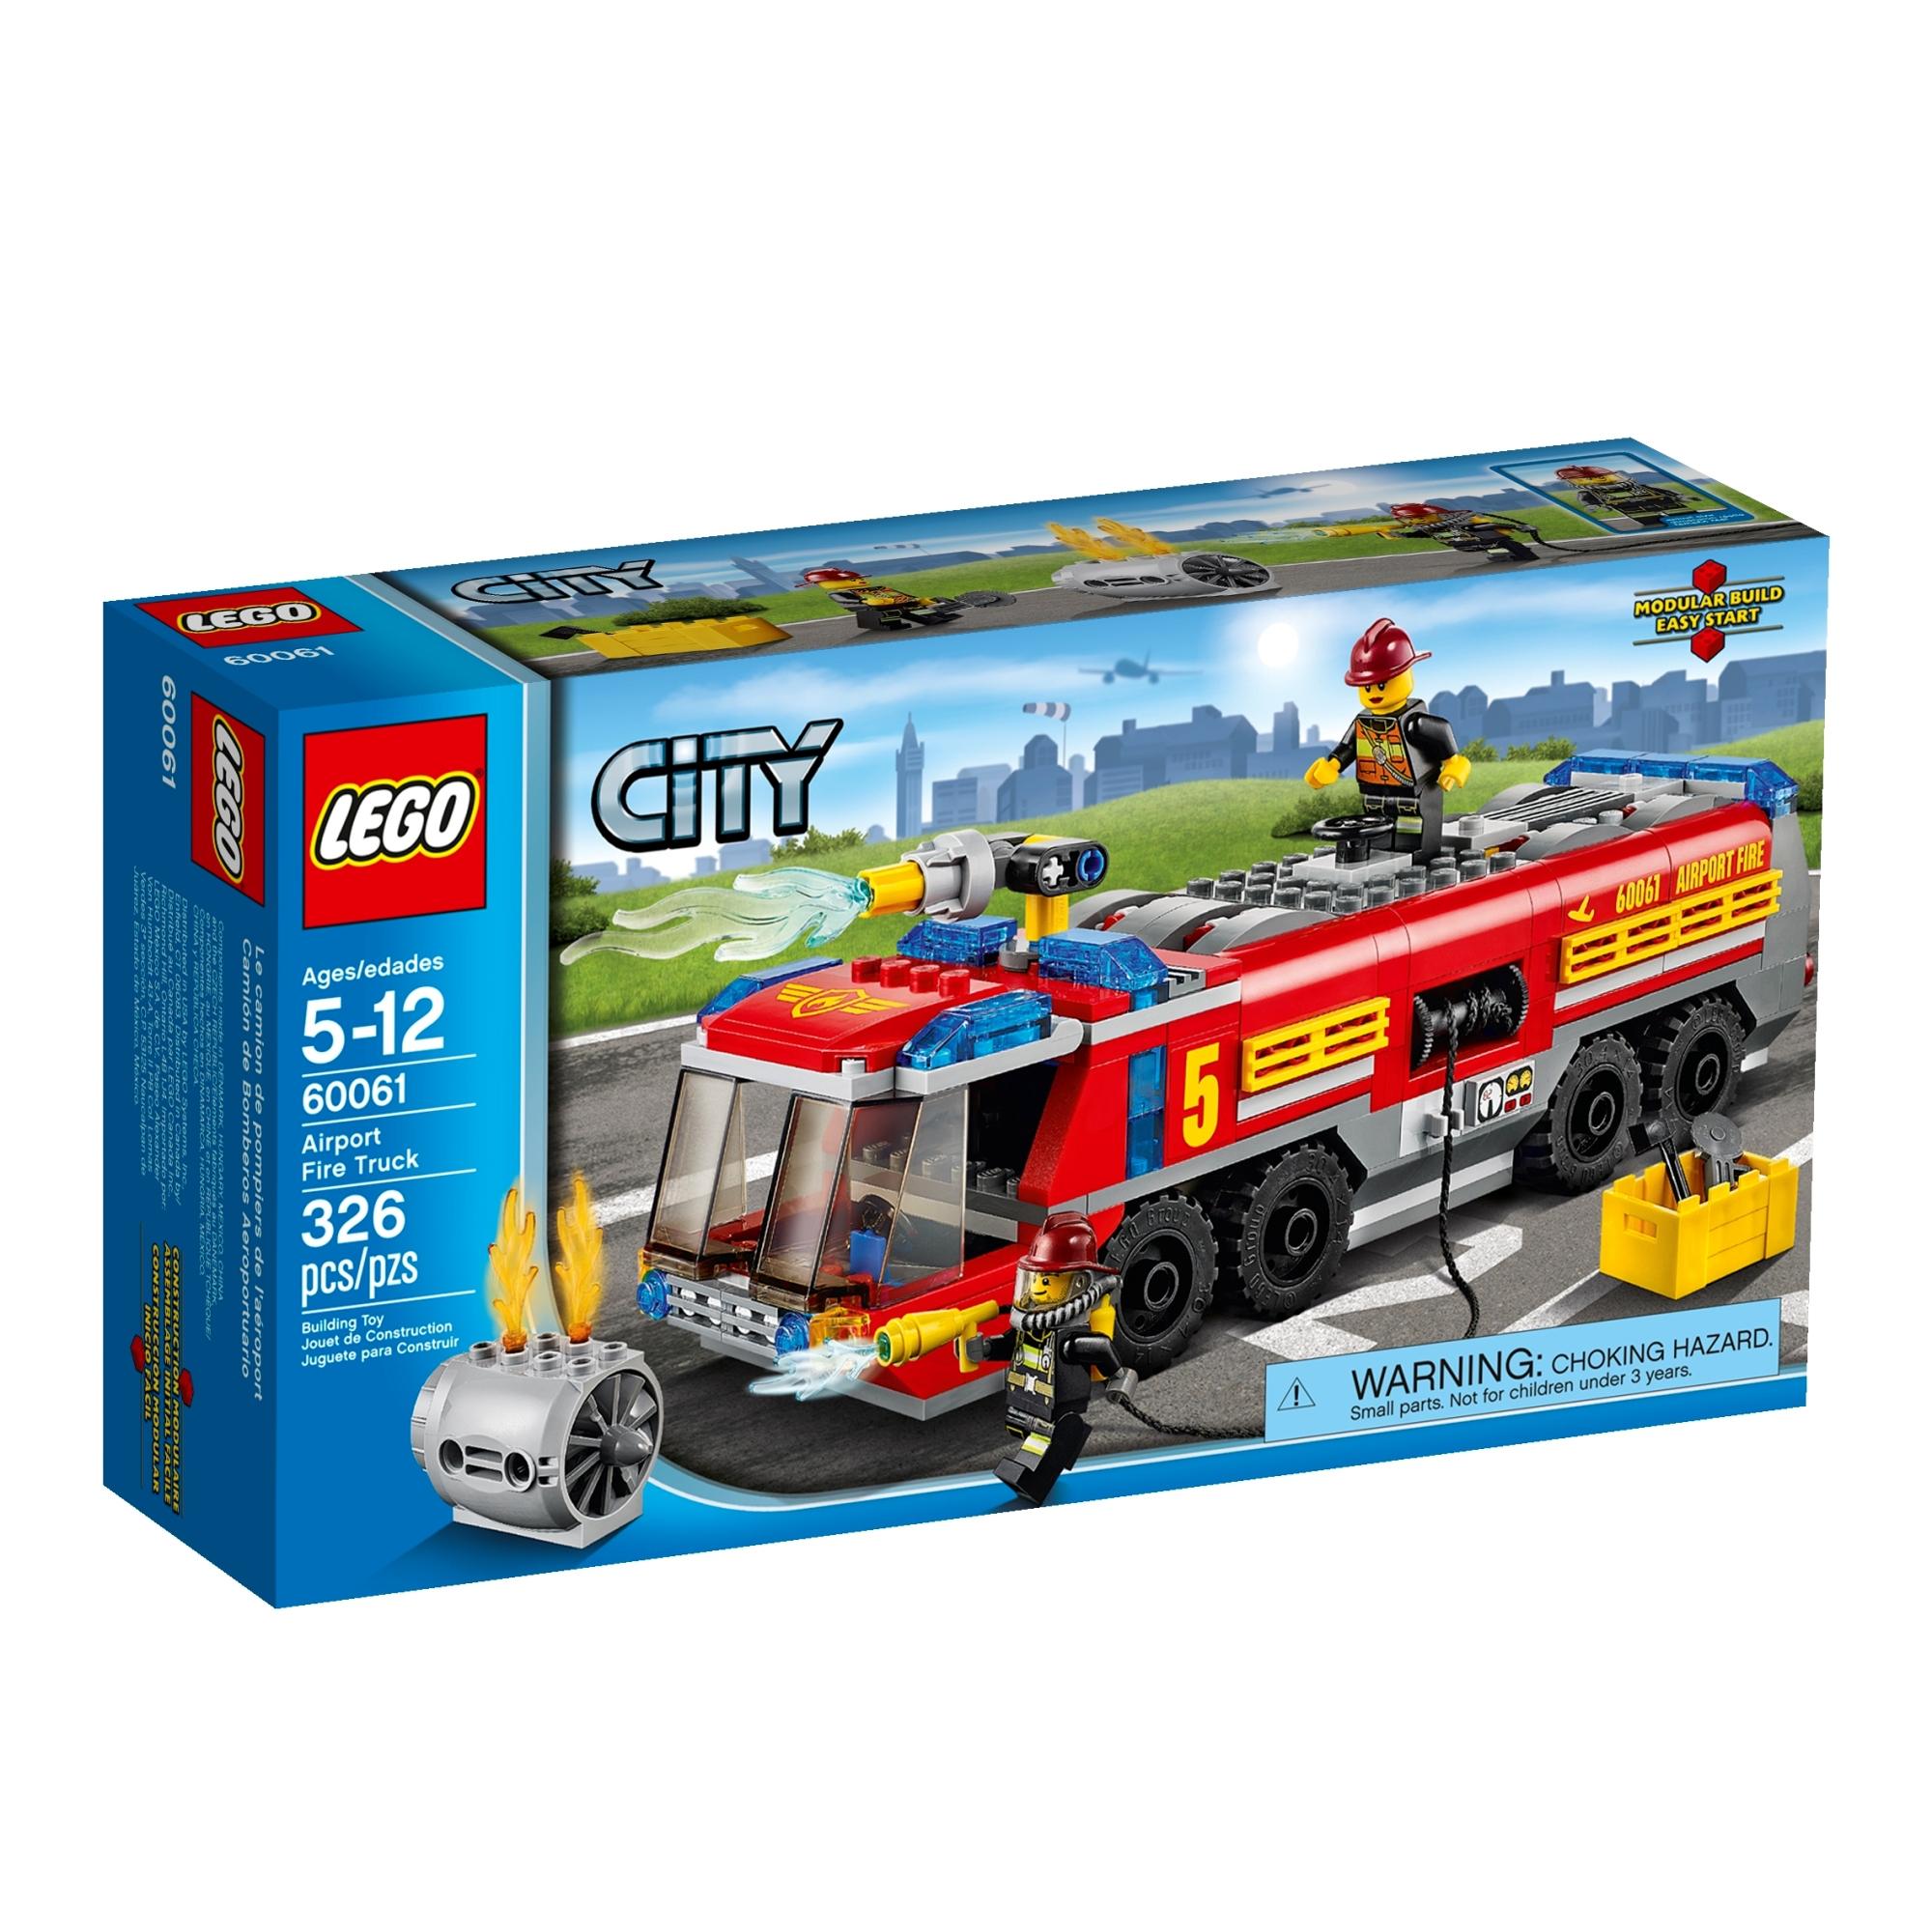 60061 Airport Fire Truck - Brickipedia, the LEGO Wiki